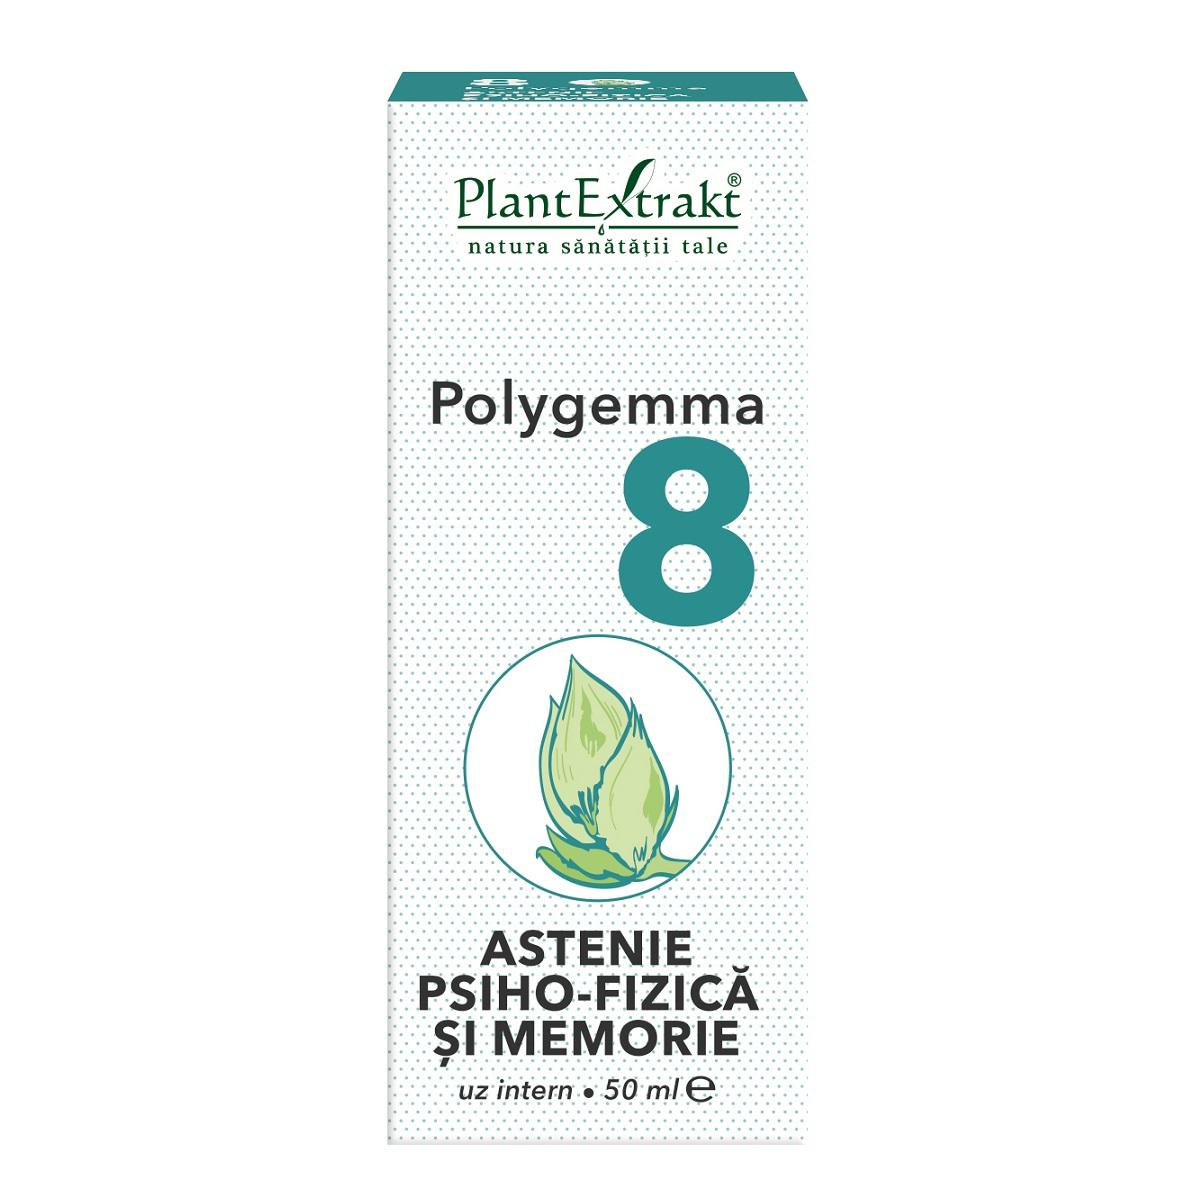 Polygemma 8 Astenie psiho-fizica si memorie, 50ml, Plant Extrakt drmax.ro